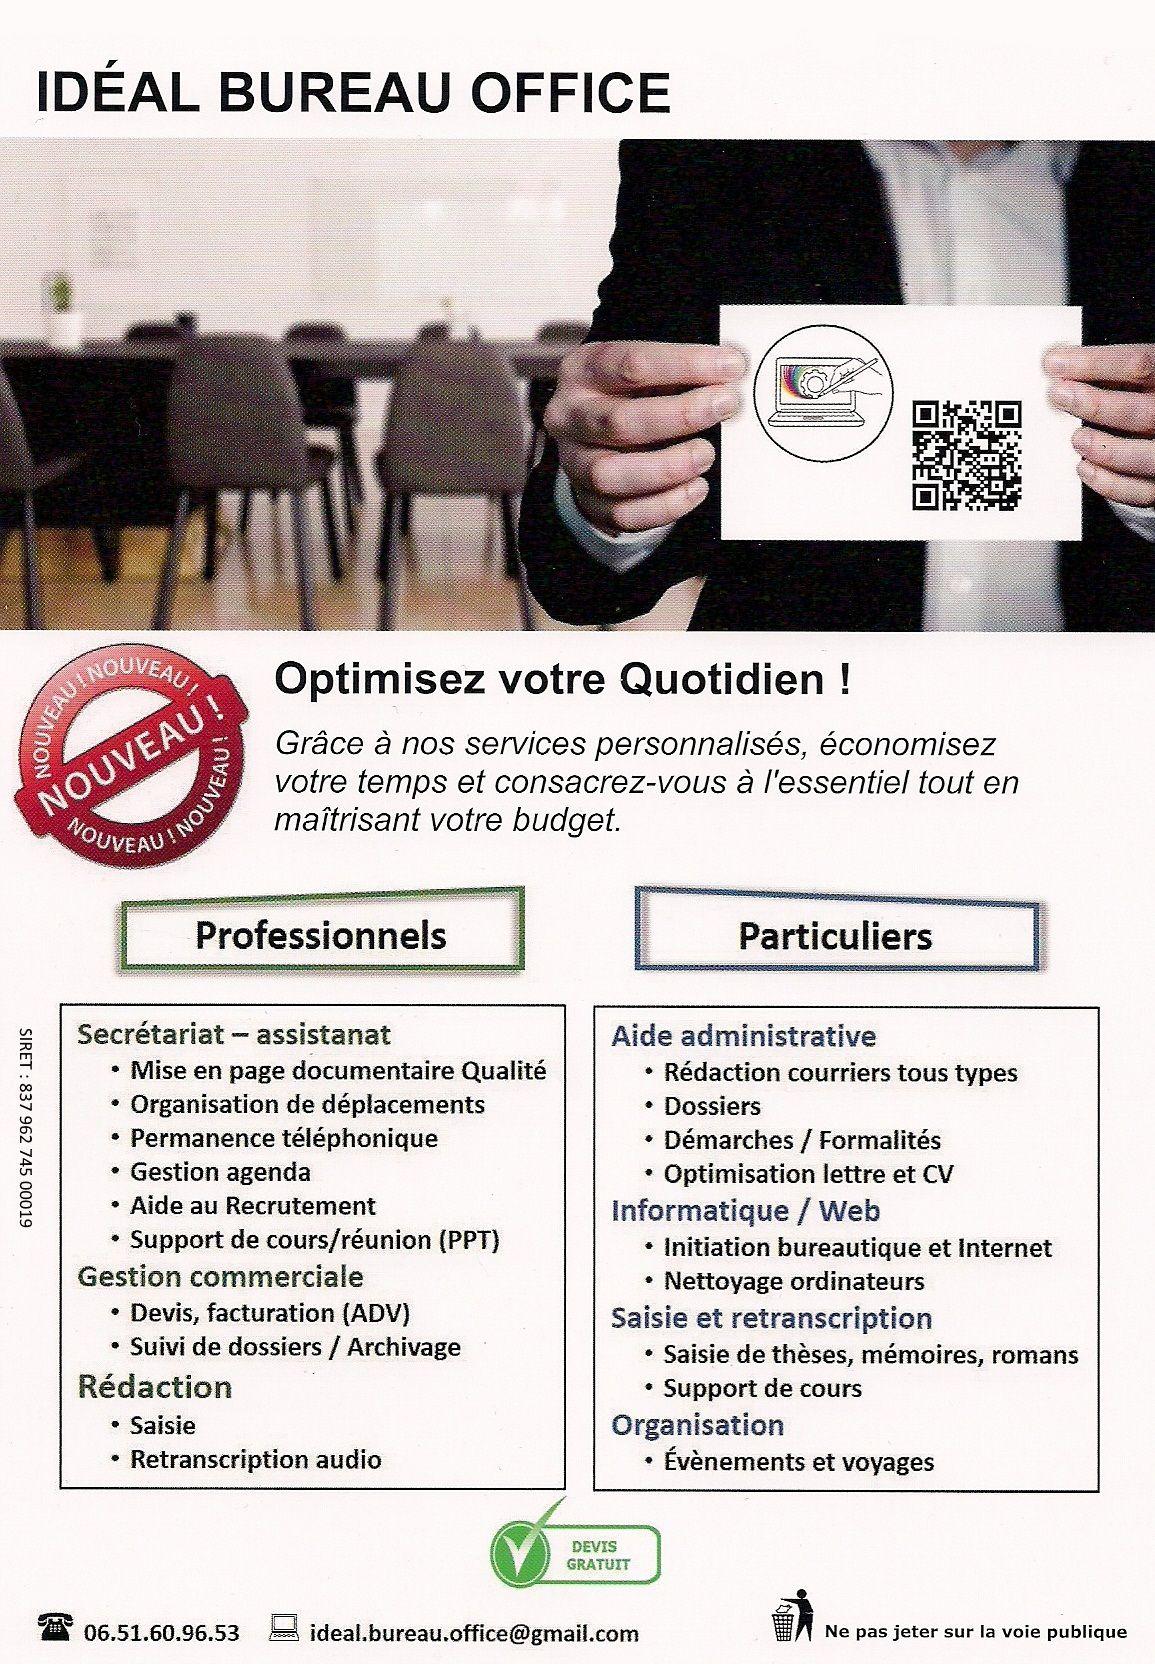 Secretariat Retranscription En Teletravail En France Et En Occitanie